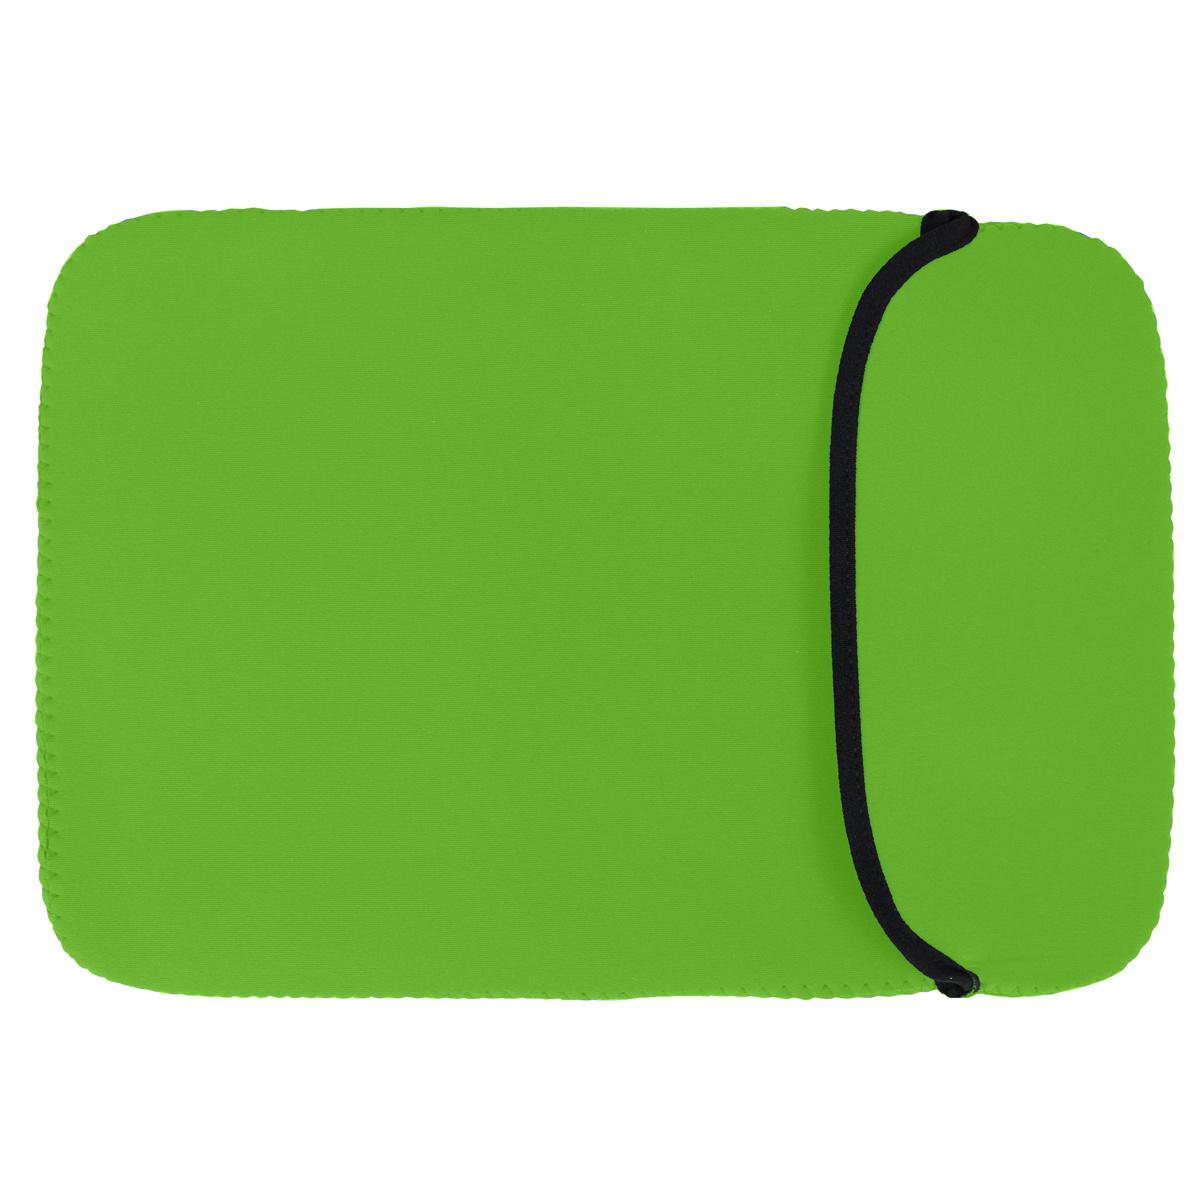 13 Inch Macbook Laptop Chromebook Neopreen sleeve case Groen